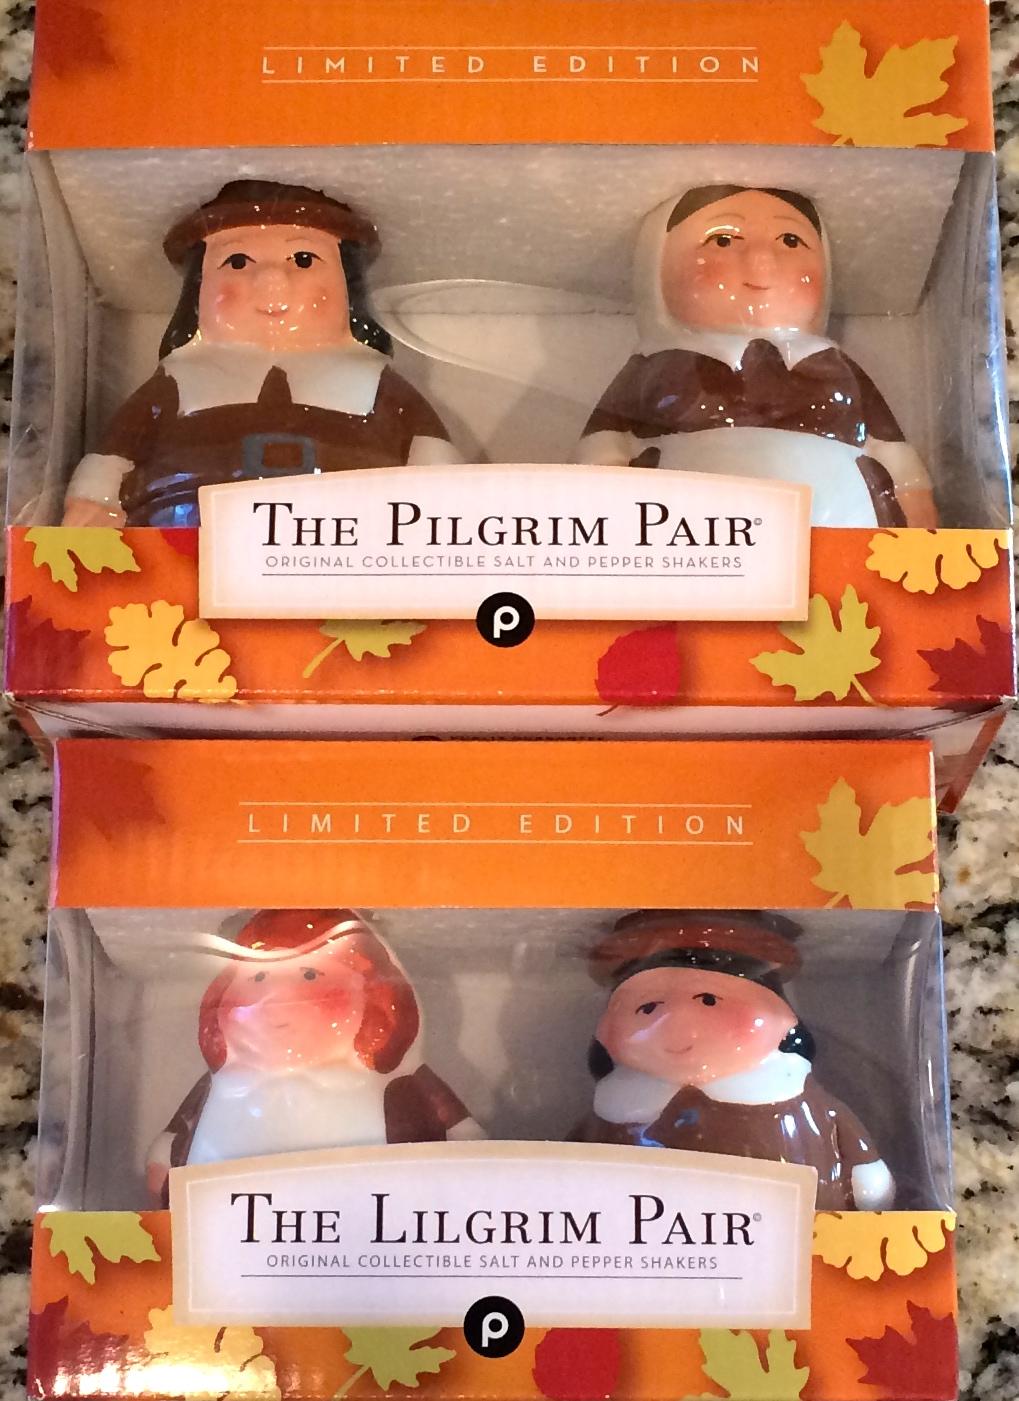 publix limited edition thanksgiving collectibles - Publix Christmas Commercial